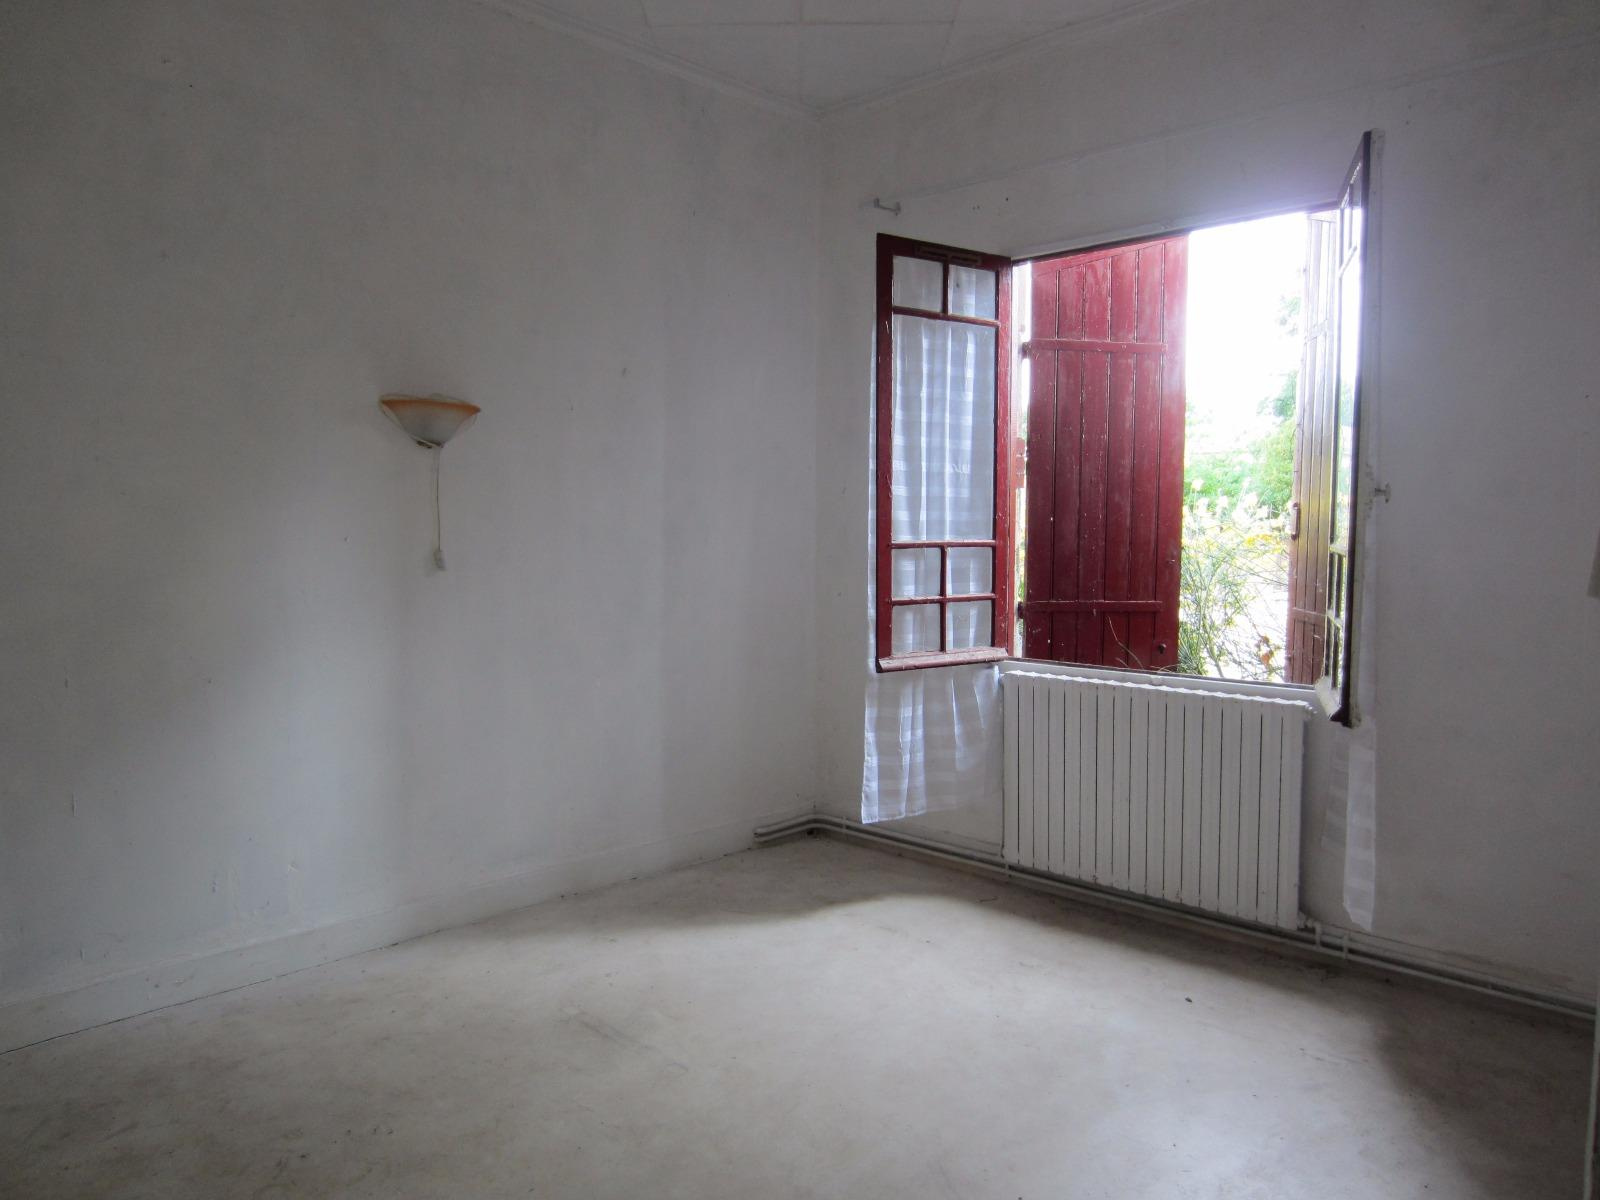 AGENCE DU LITTORAL : Agence immobilière